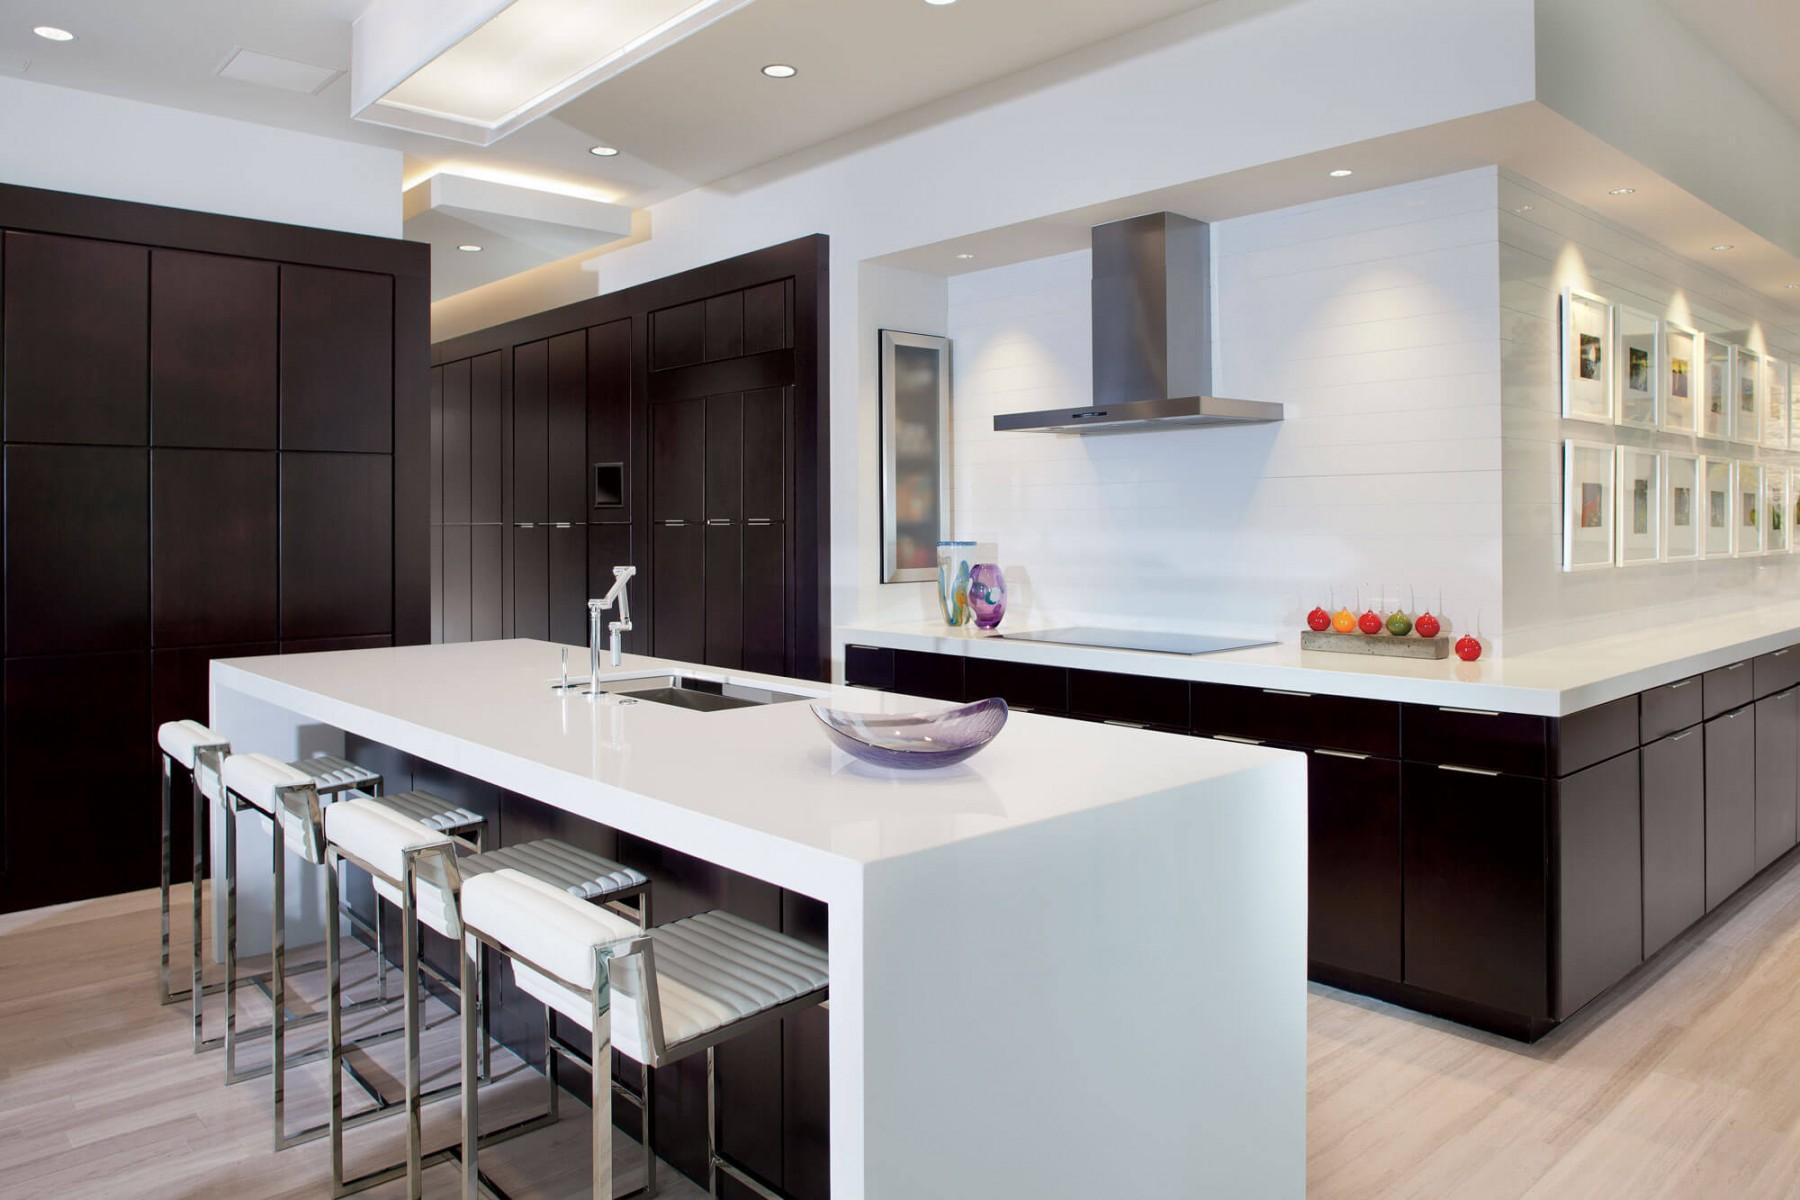 C mo decorar una cocina moderna todo lo que debes saber for Cocinas tipo americano modernas